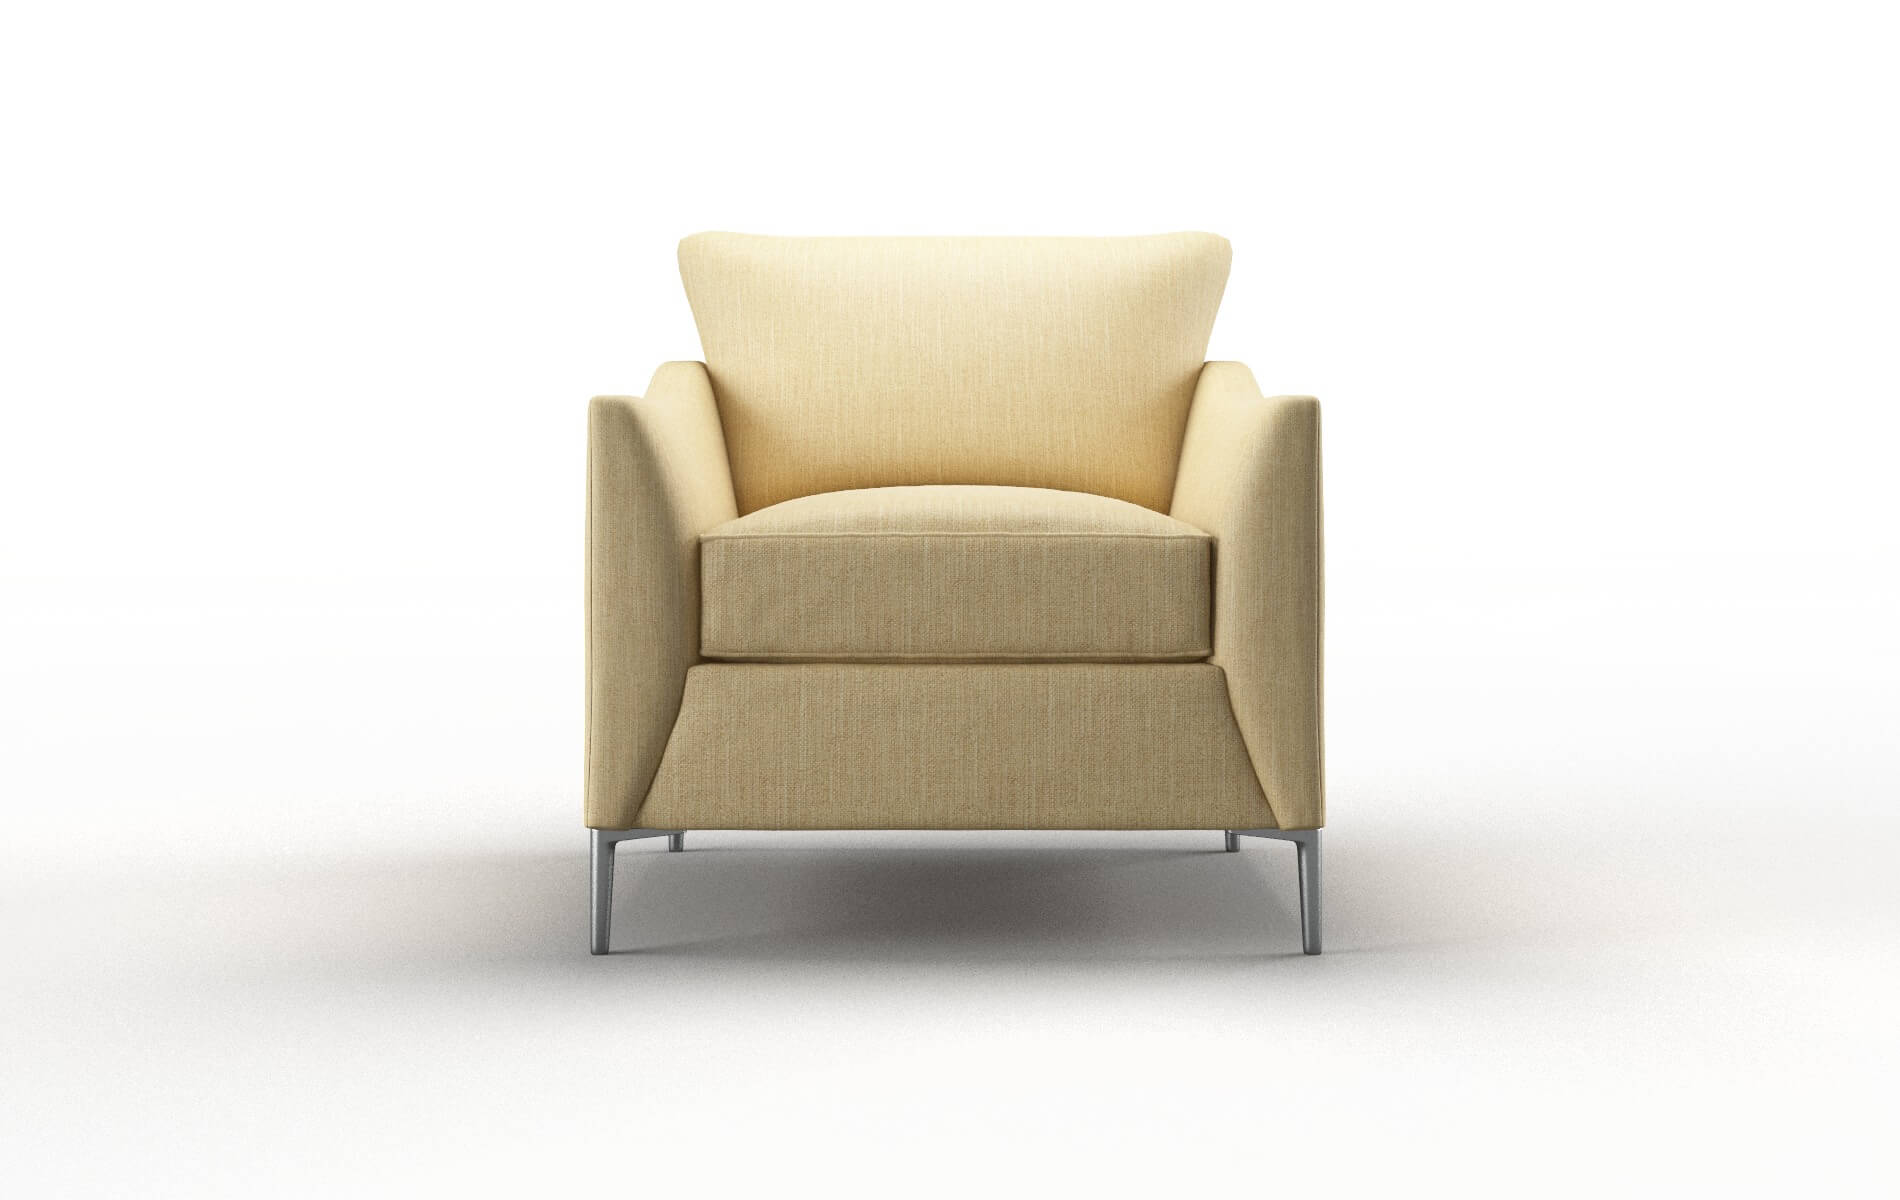 Hamburg Malibu Maize Chair metal legs 1